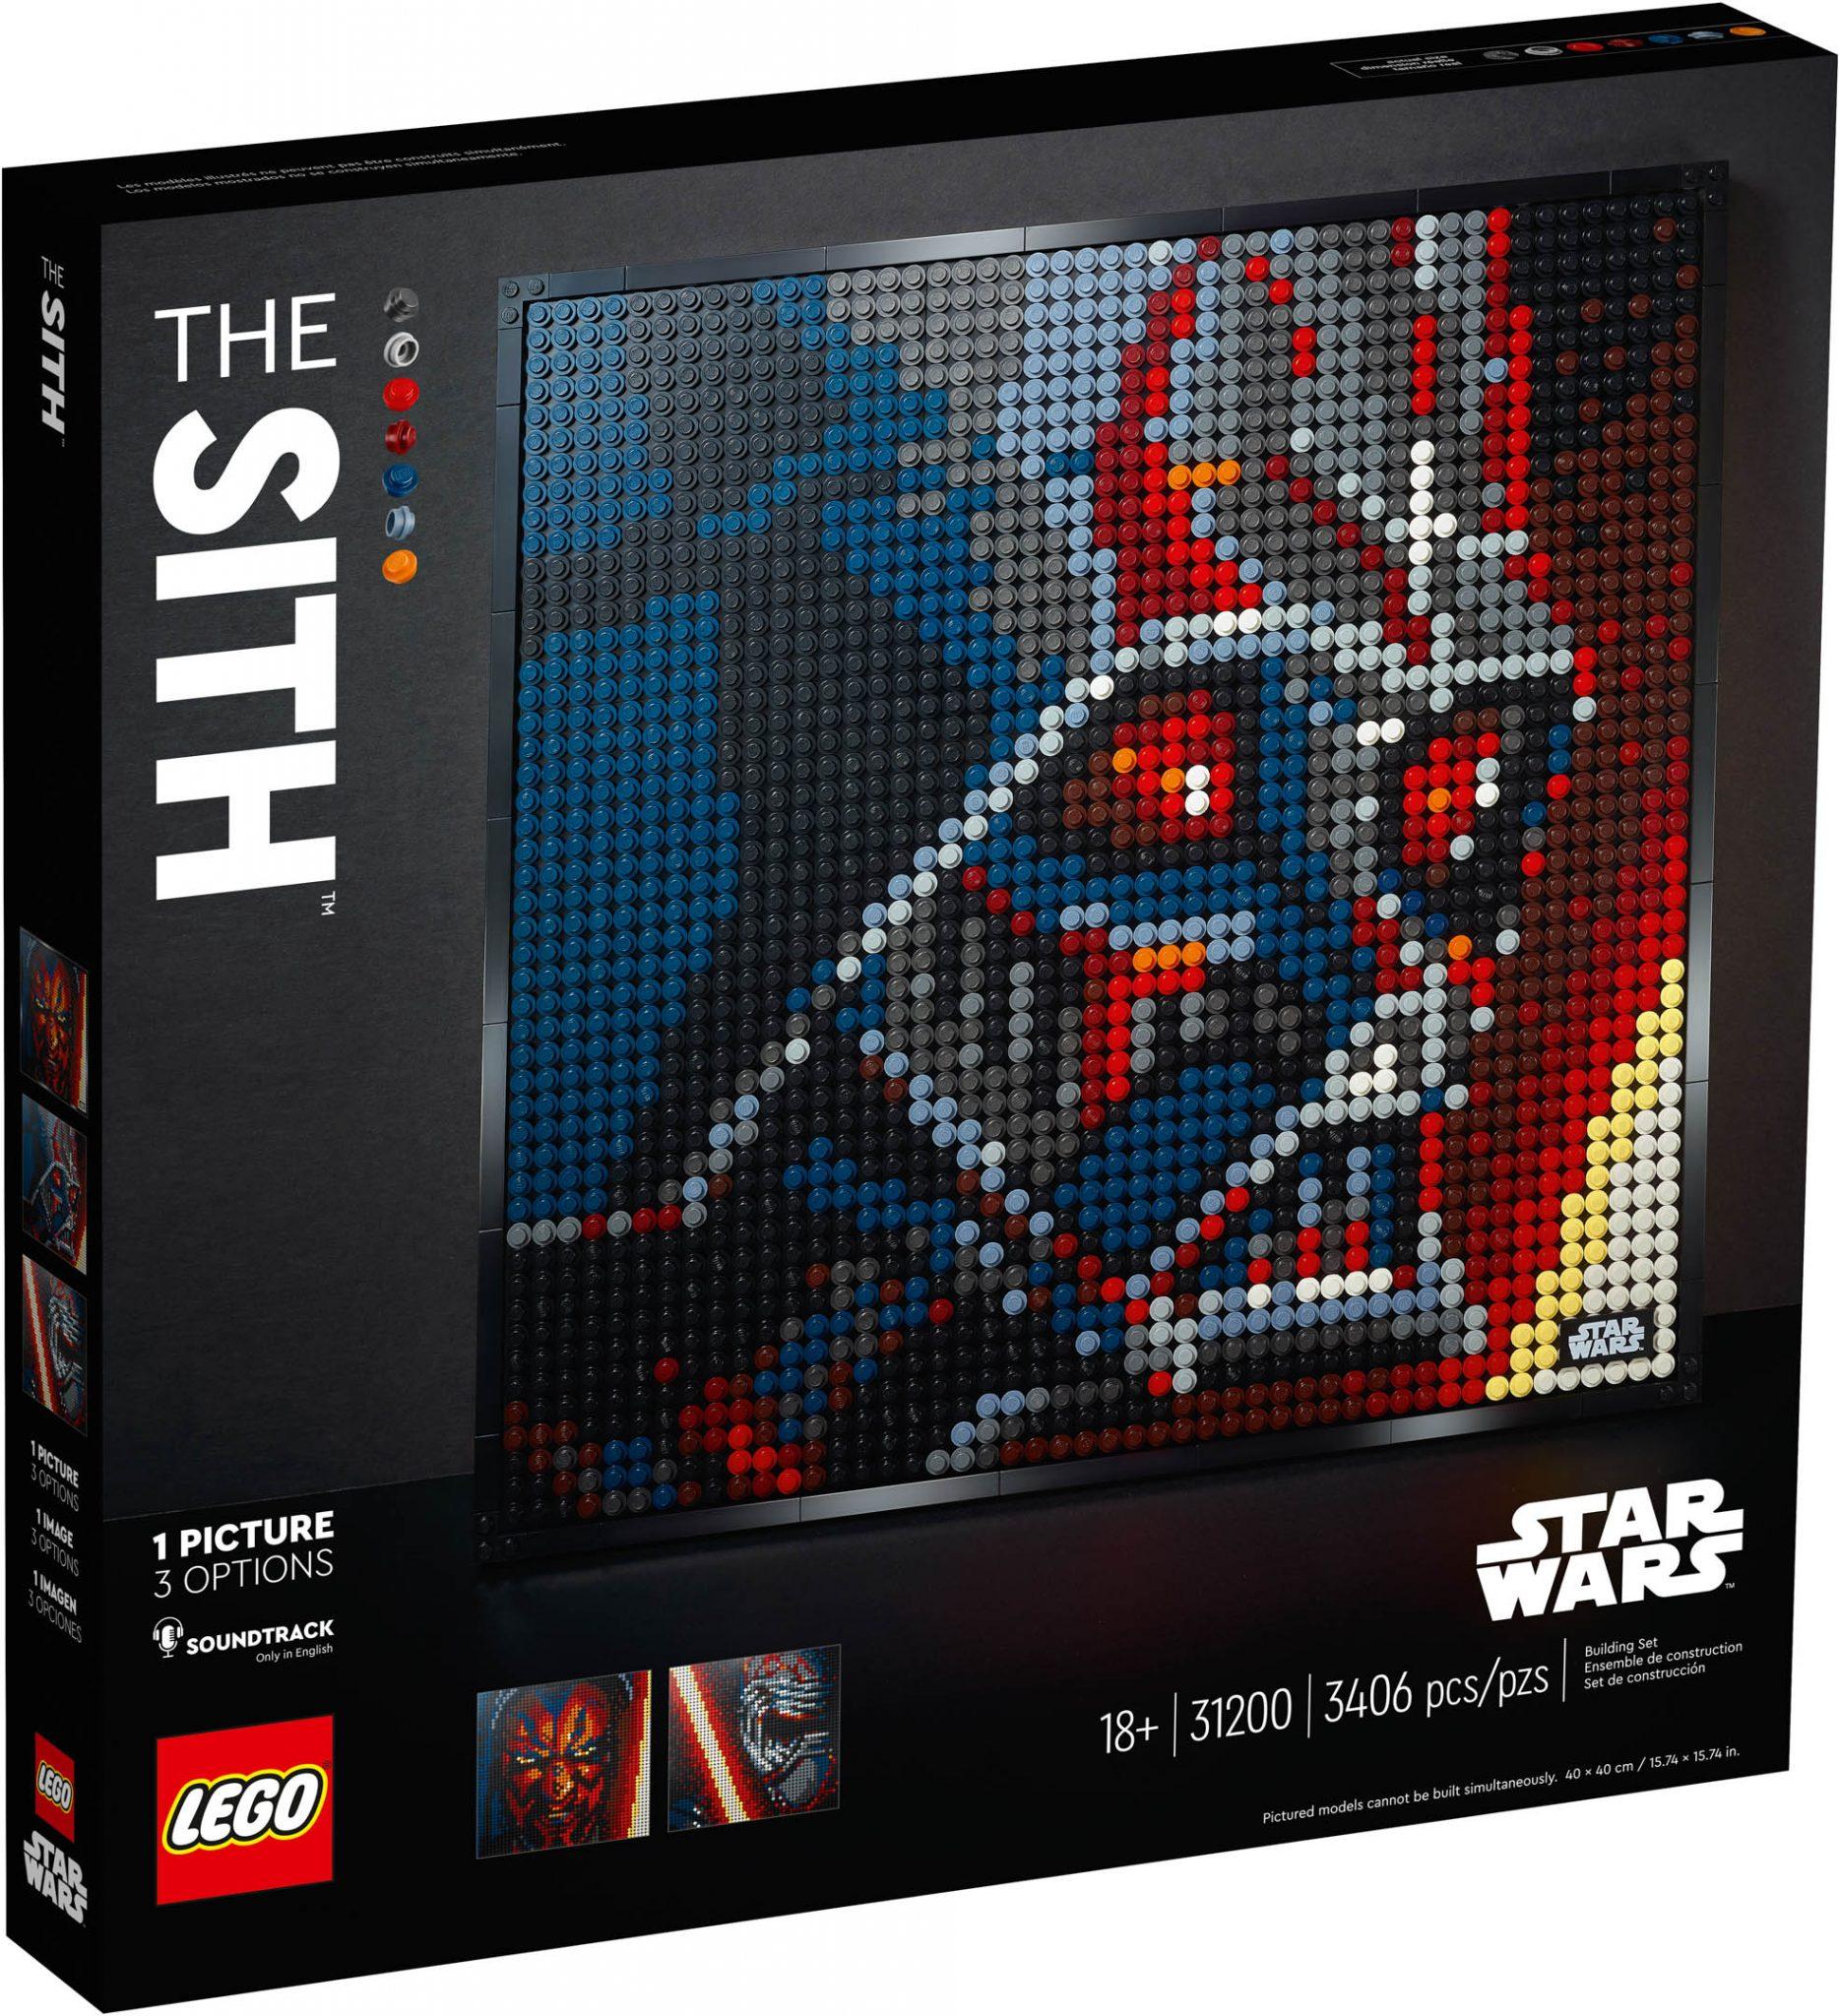 LEGO-Art-31200-Star-Wars-The-Sith-T9AVN-4-1868x2048.jpg